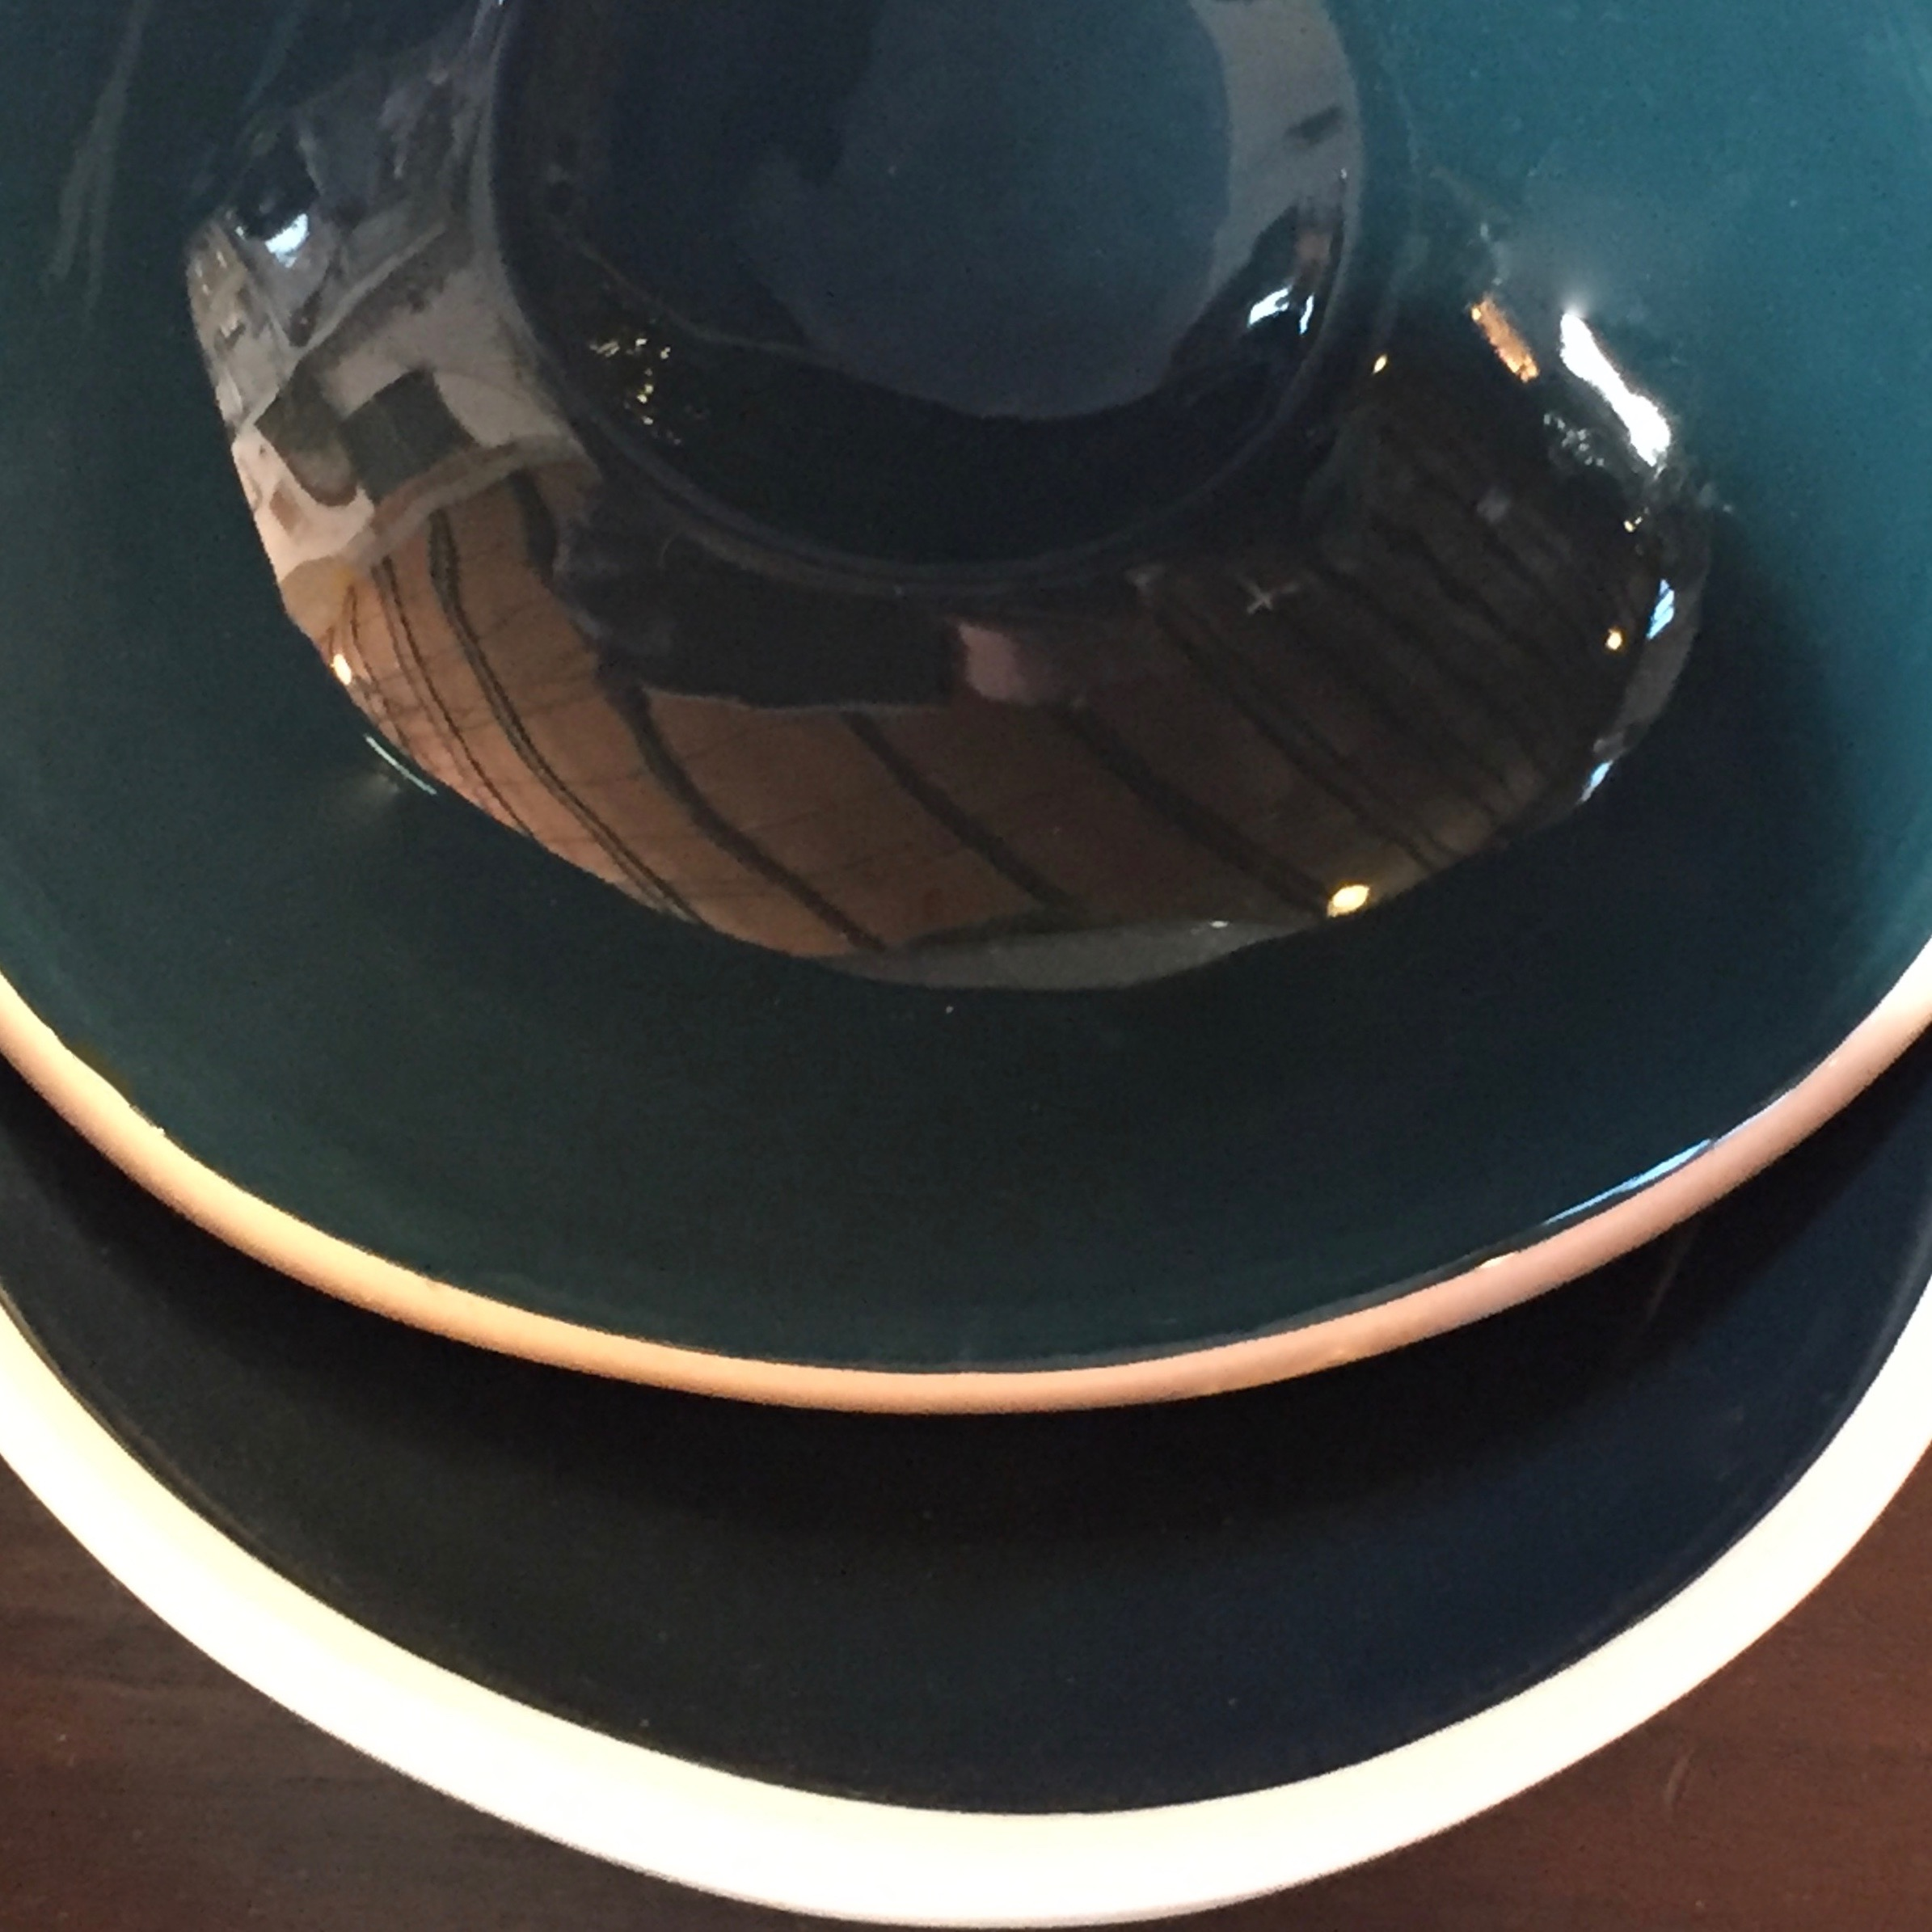 Teal Bowls